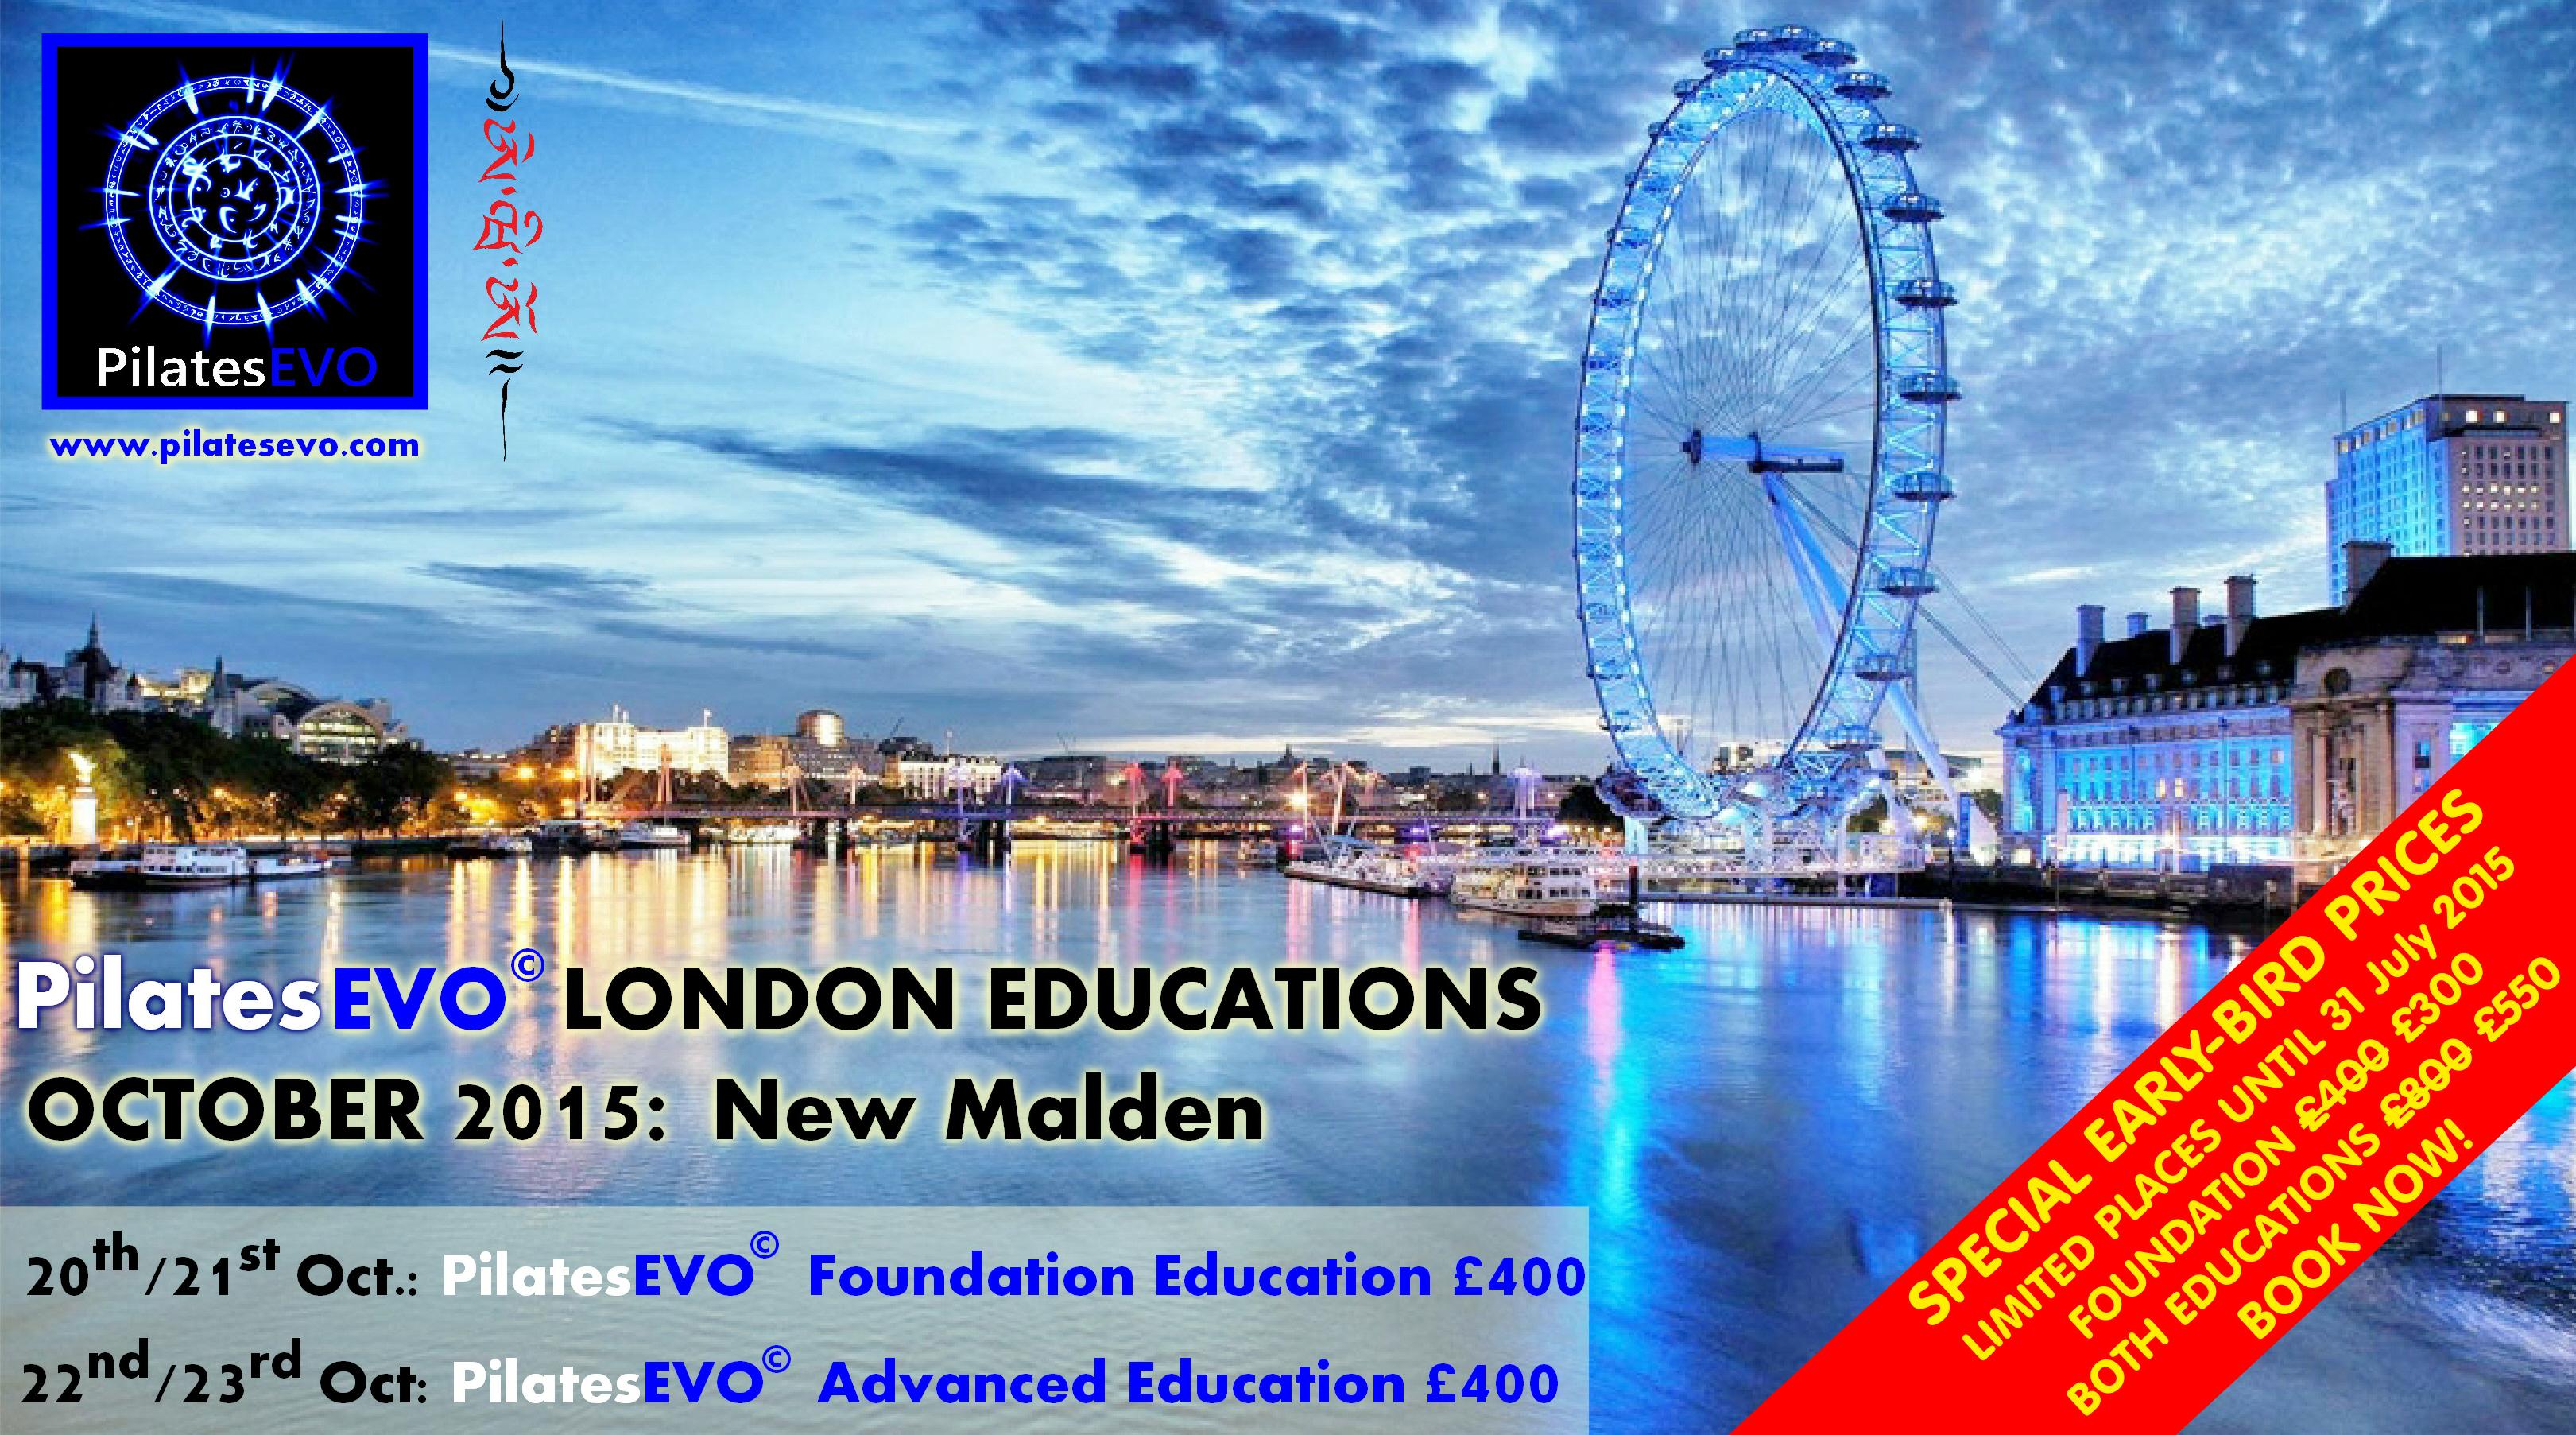 PilatesEVO London Educations Oct 2015 v.1